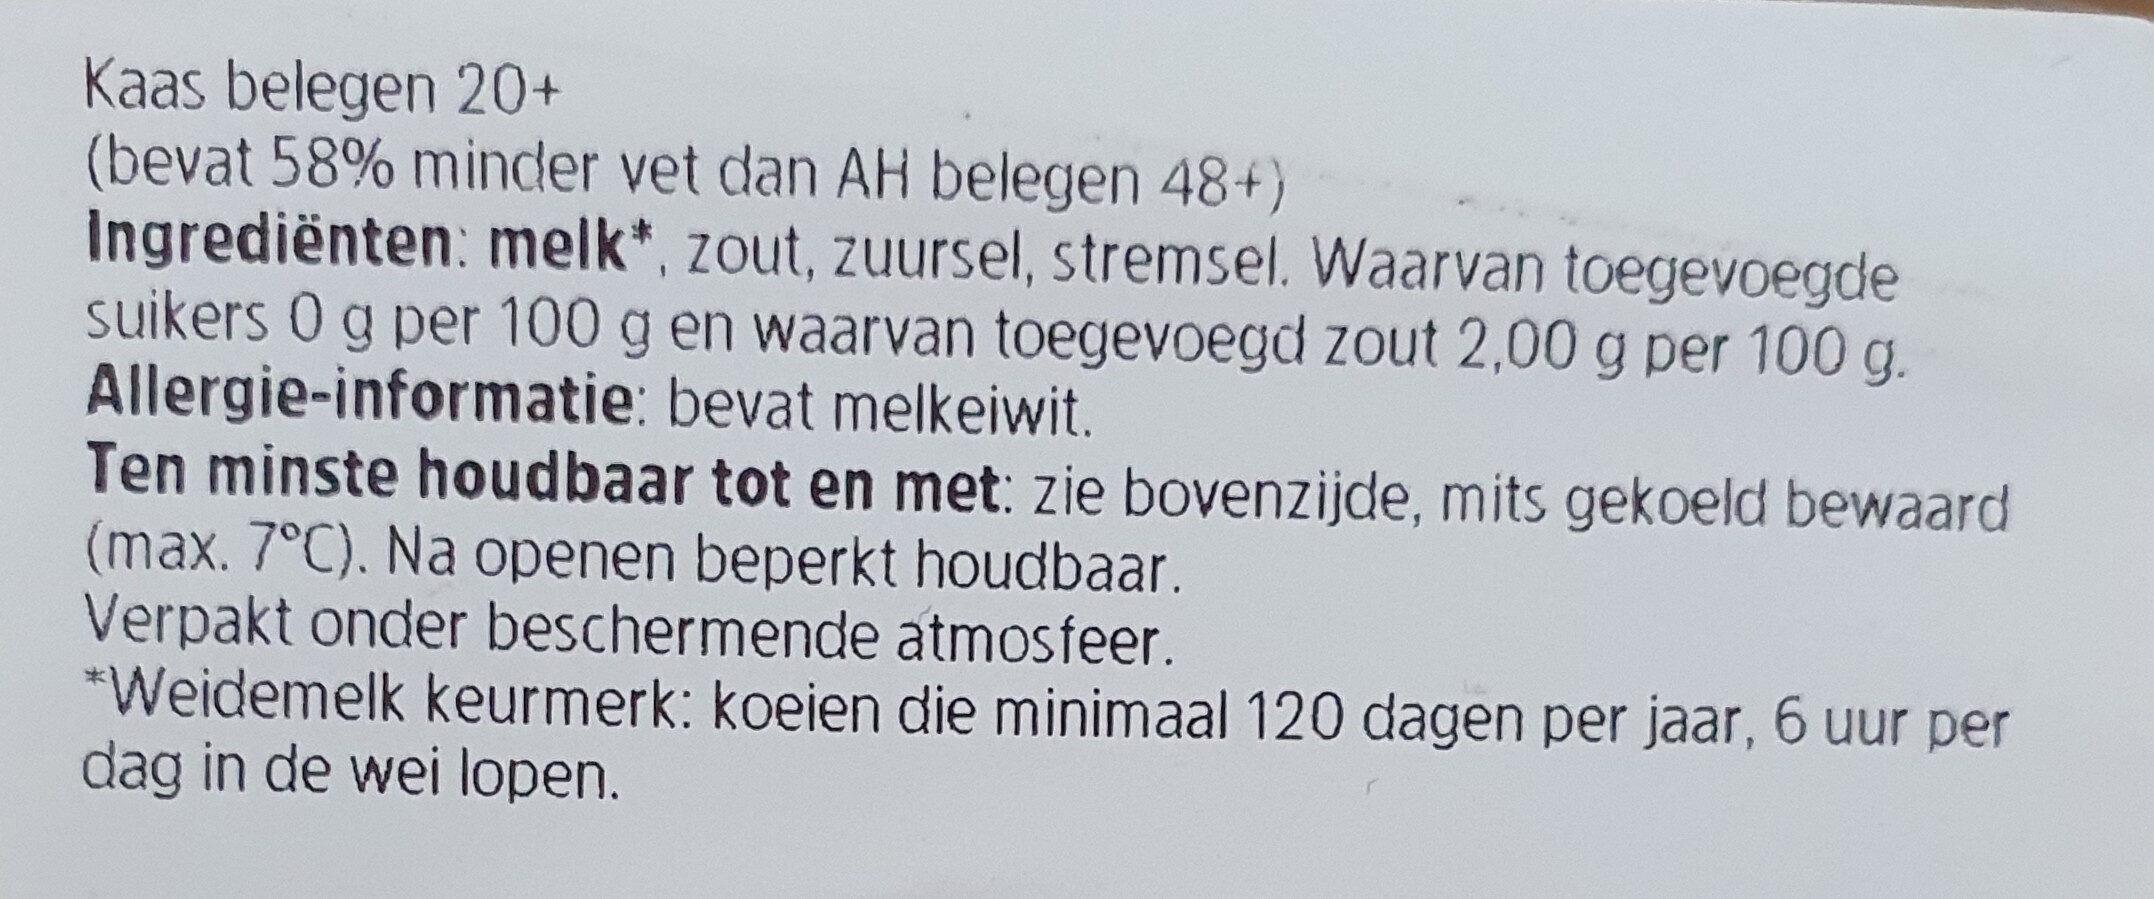 Kaas 20+ belegen - Ingredients - nl